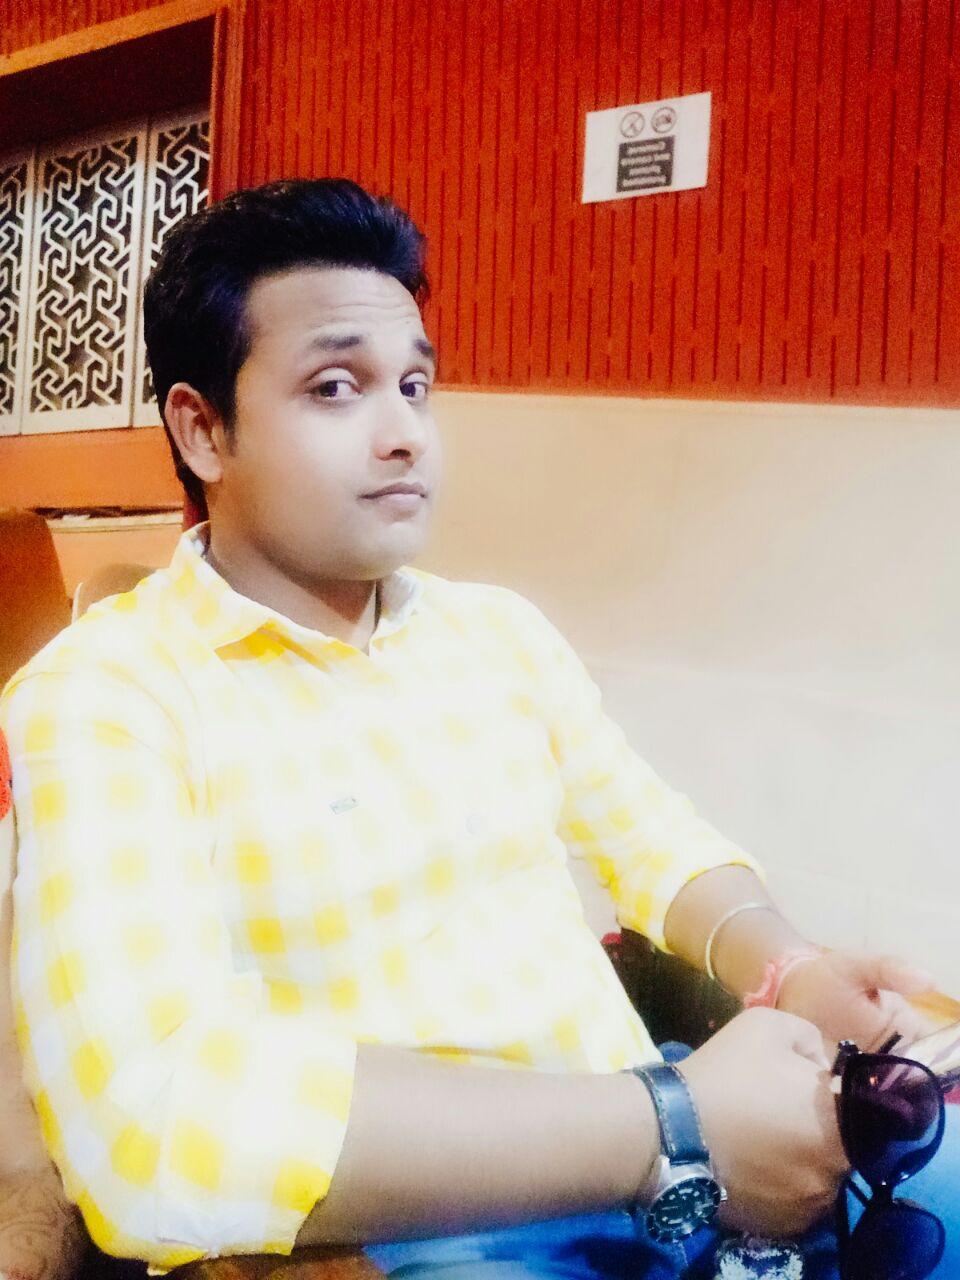 Rajib Chakraborty